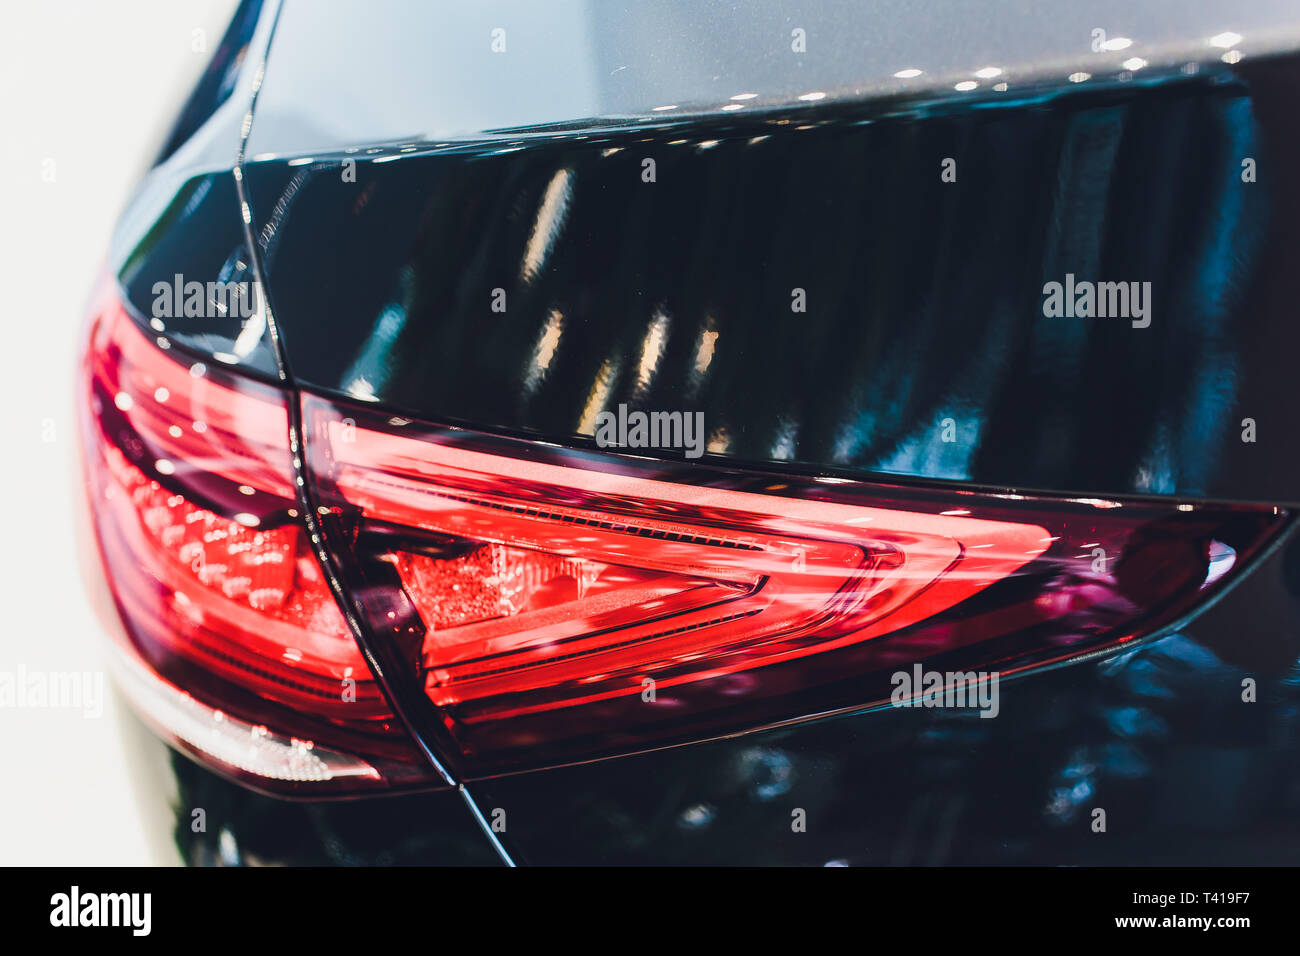 Back view of new black car. Closeup headlights of car. Black premium city crossover, luxury SUV rear light closeup. Car lamp close-up. Stock Photo